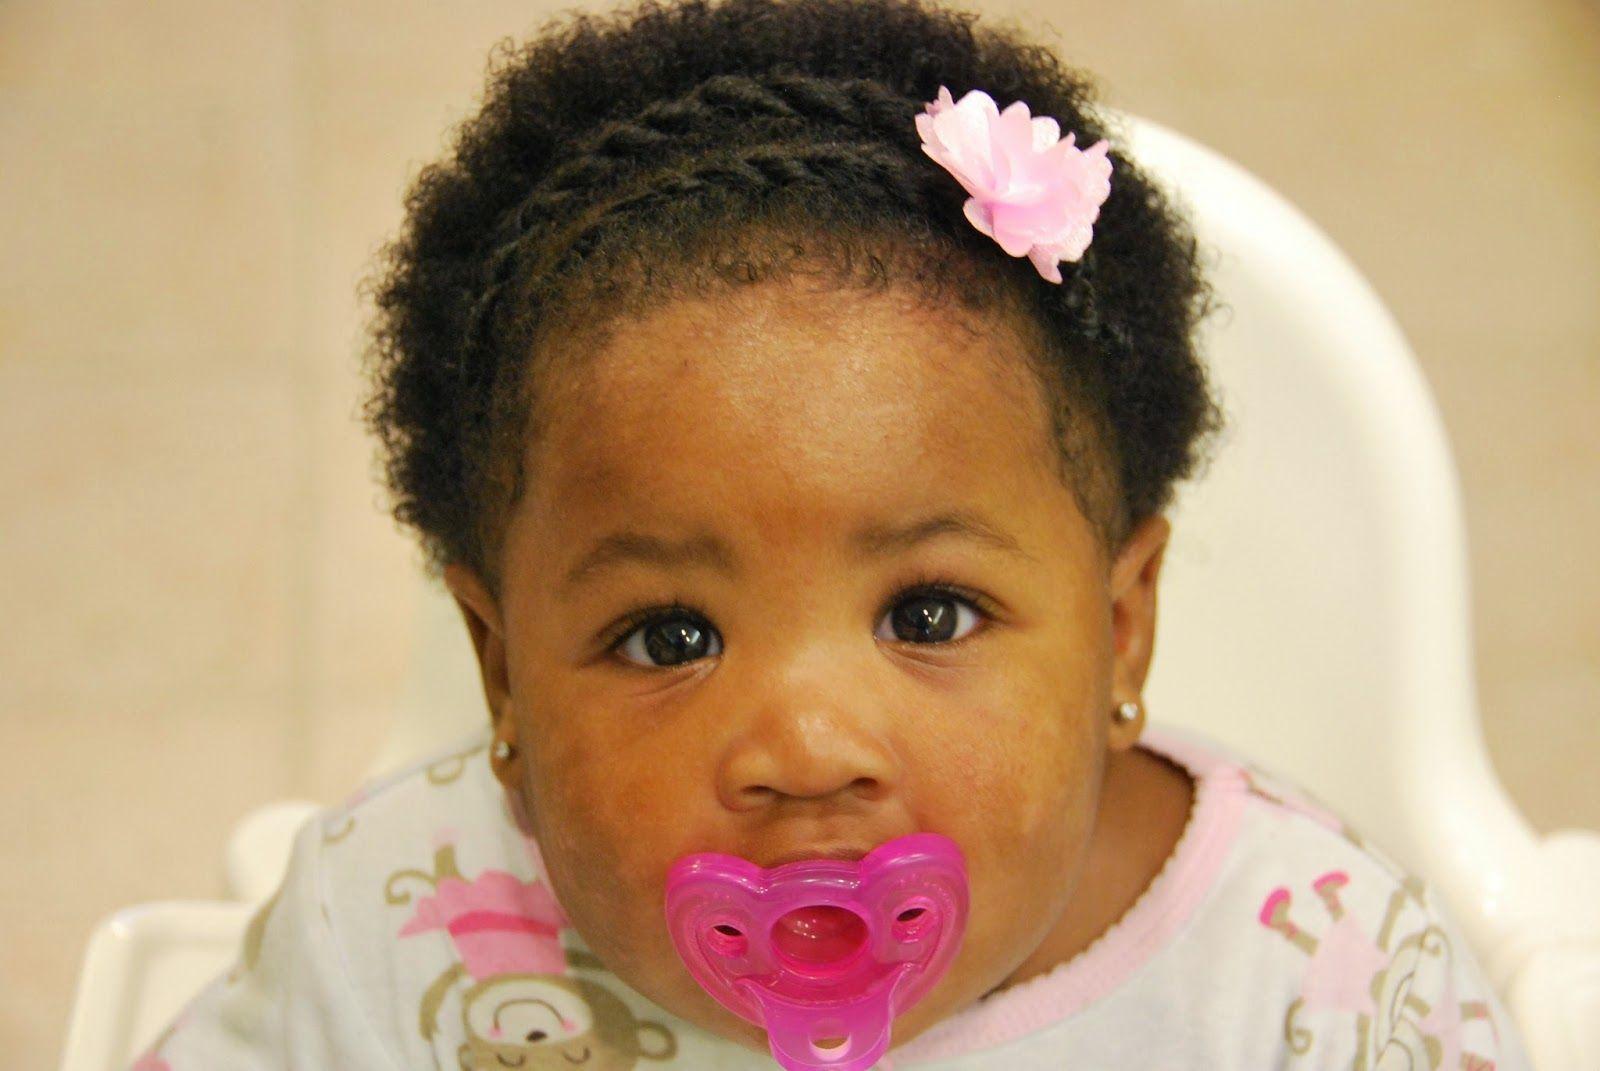 Black Baby Hair Styles Google Search Black Baby Hairstyles Black Baby Girl Hairstyles Baby Girl Hairstyles